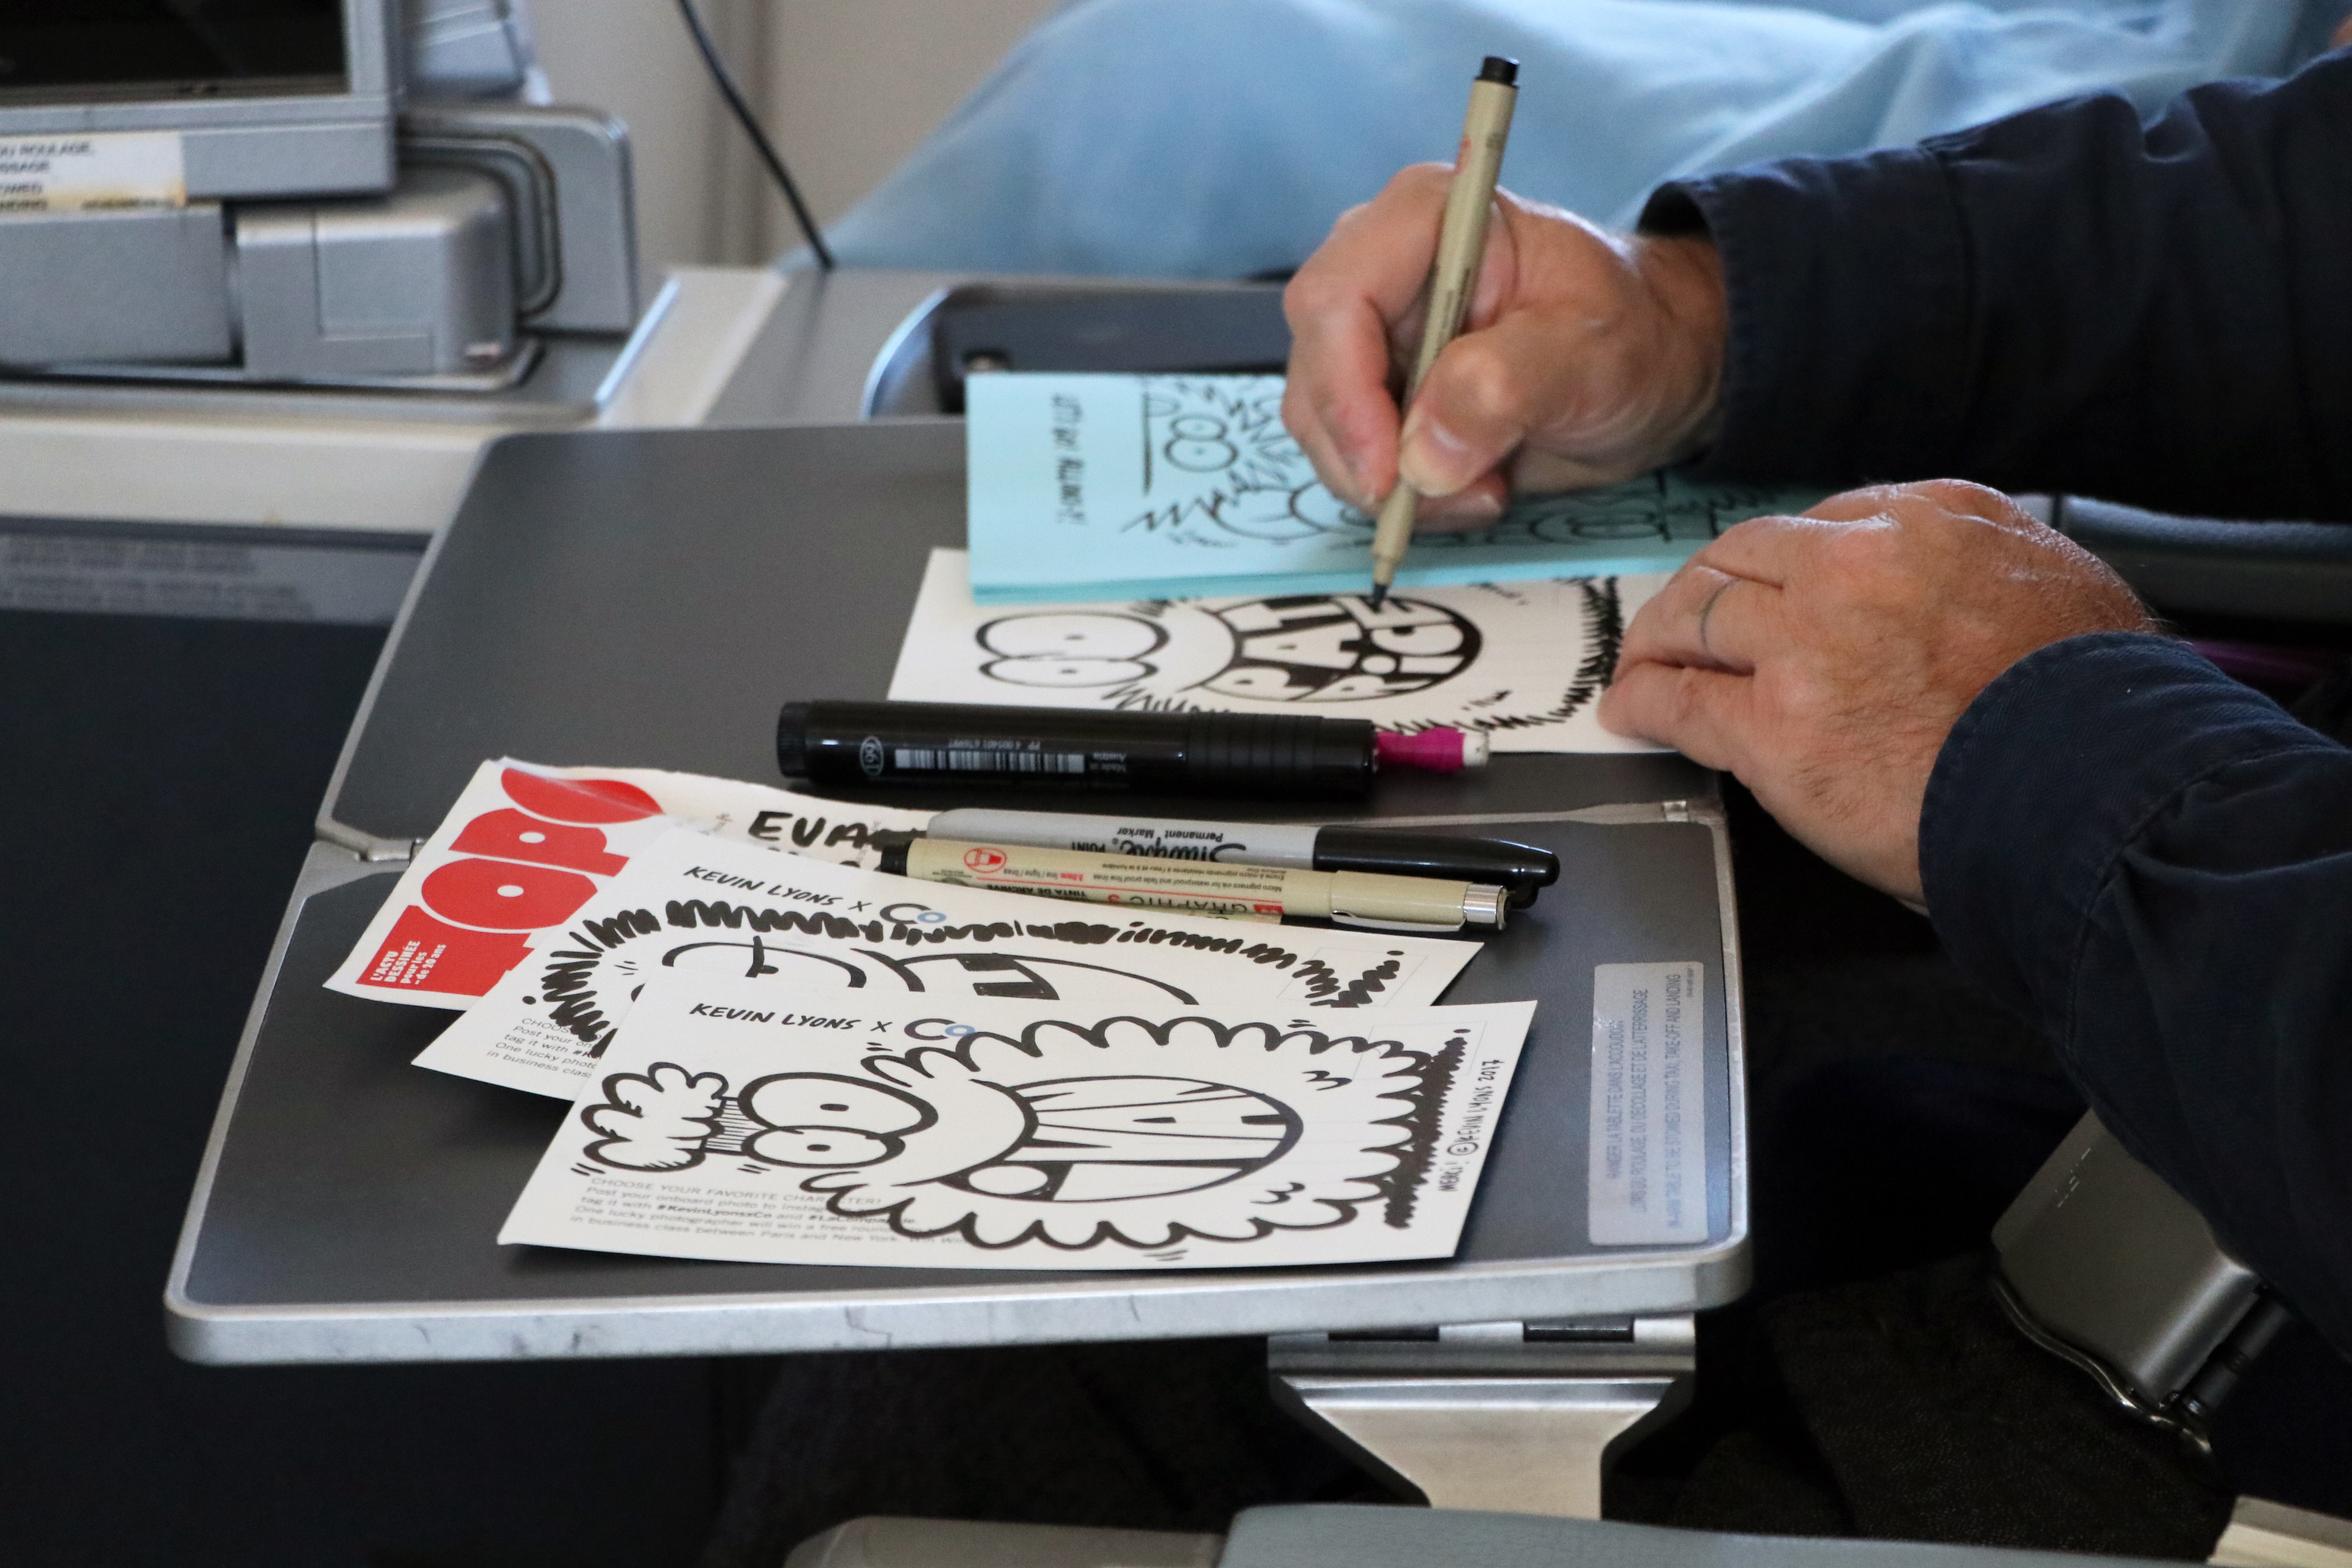 Kevin Lyons Illustrator illustriert